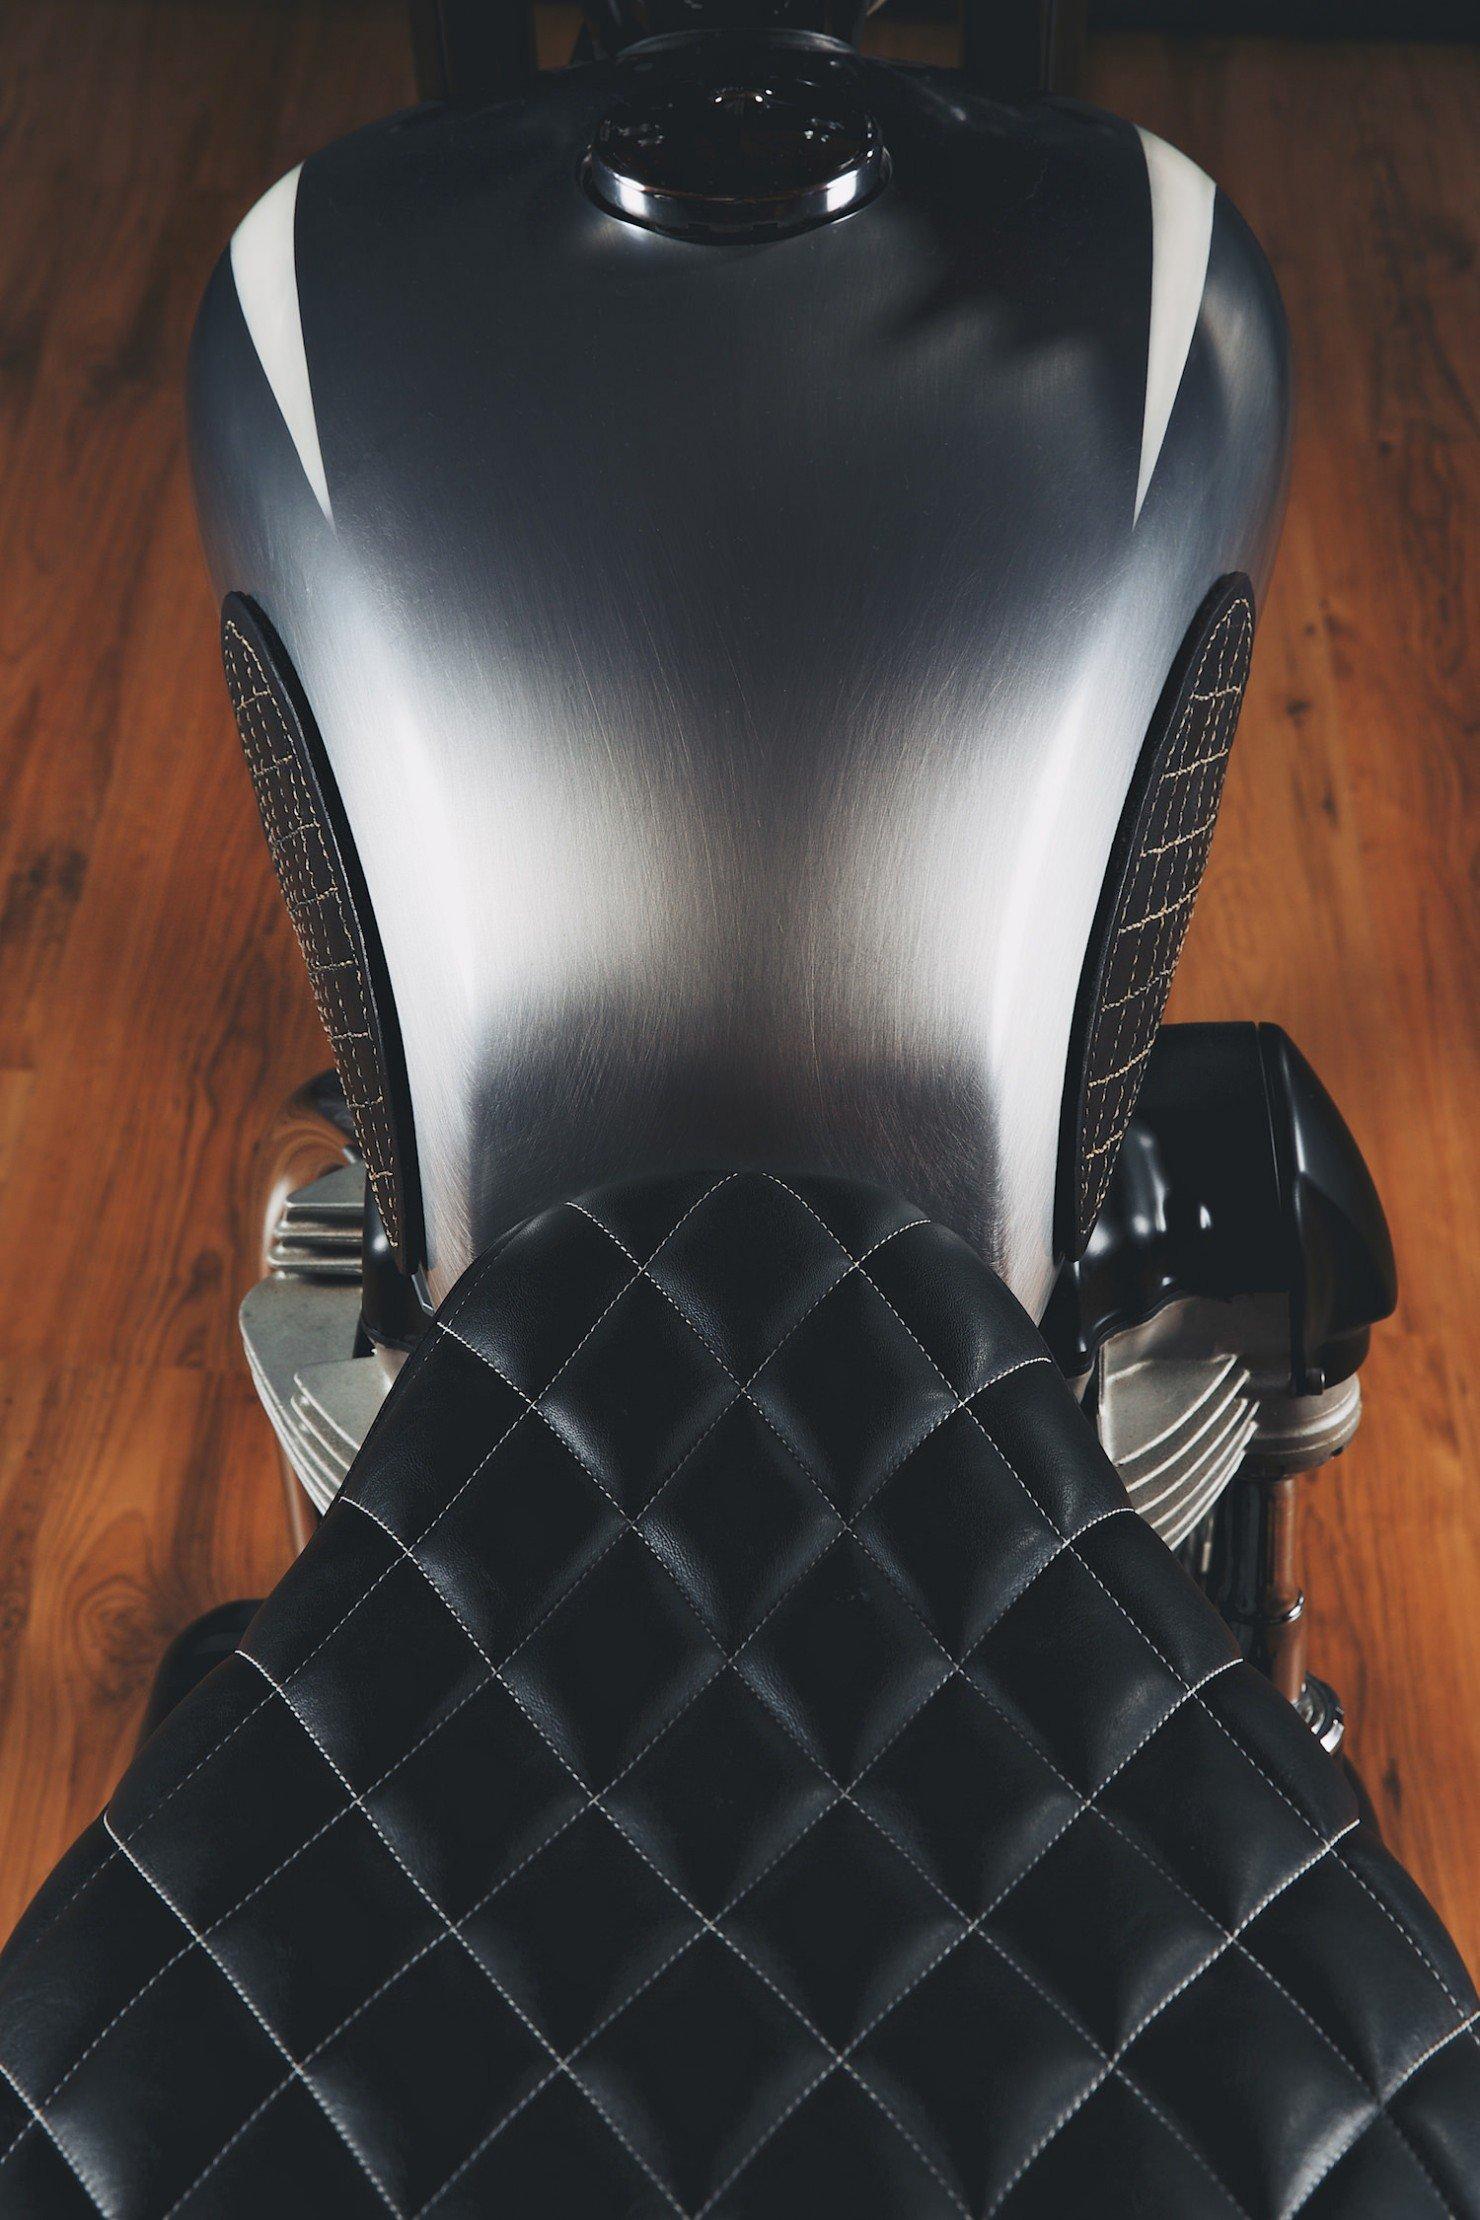 Kawasaki W650 Motorcycle 14 1480x2220 Kawasaki W650